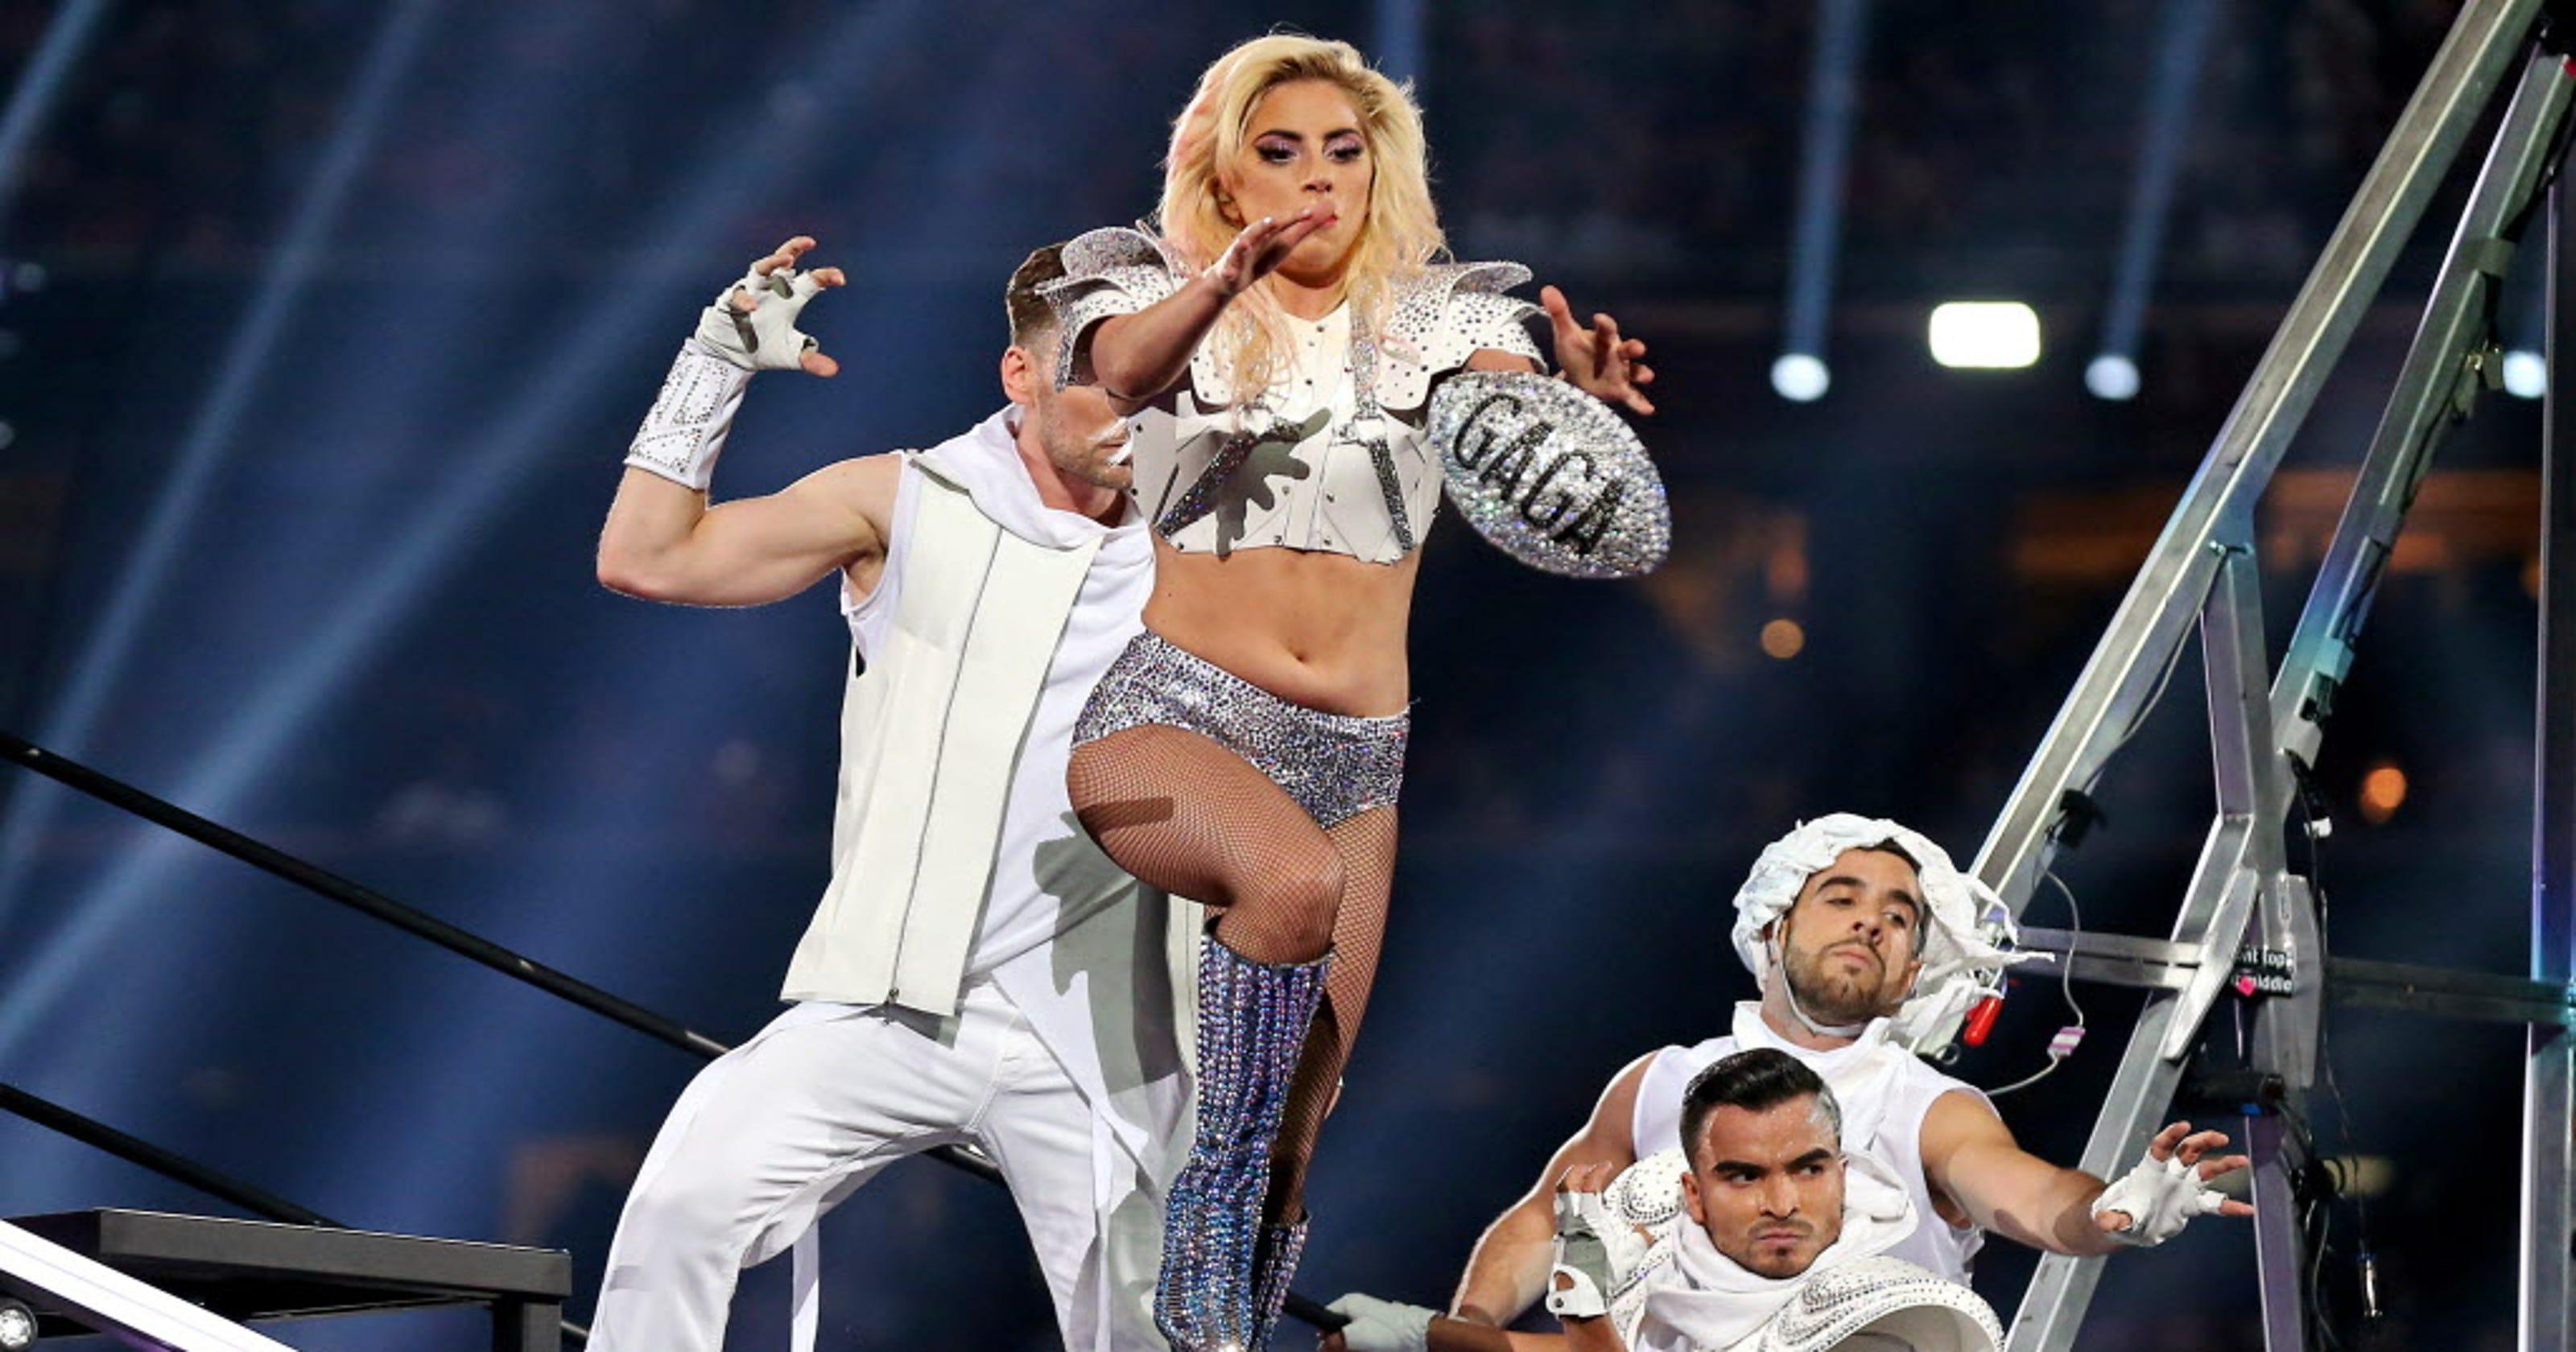 Best of Lady Gaga's Super Bowl LI halftime show